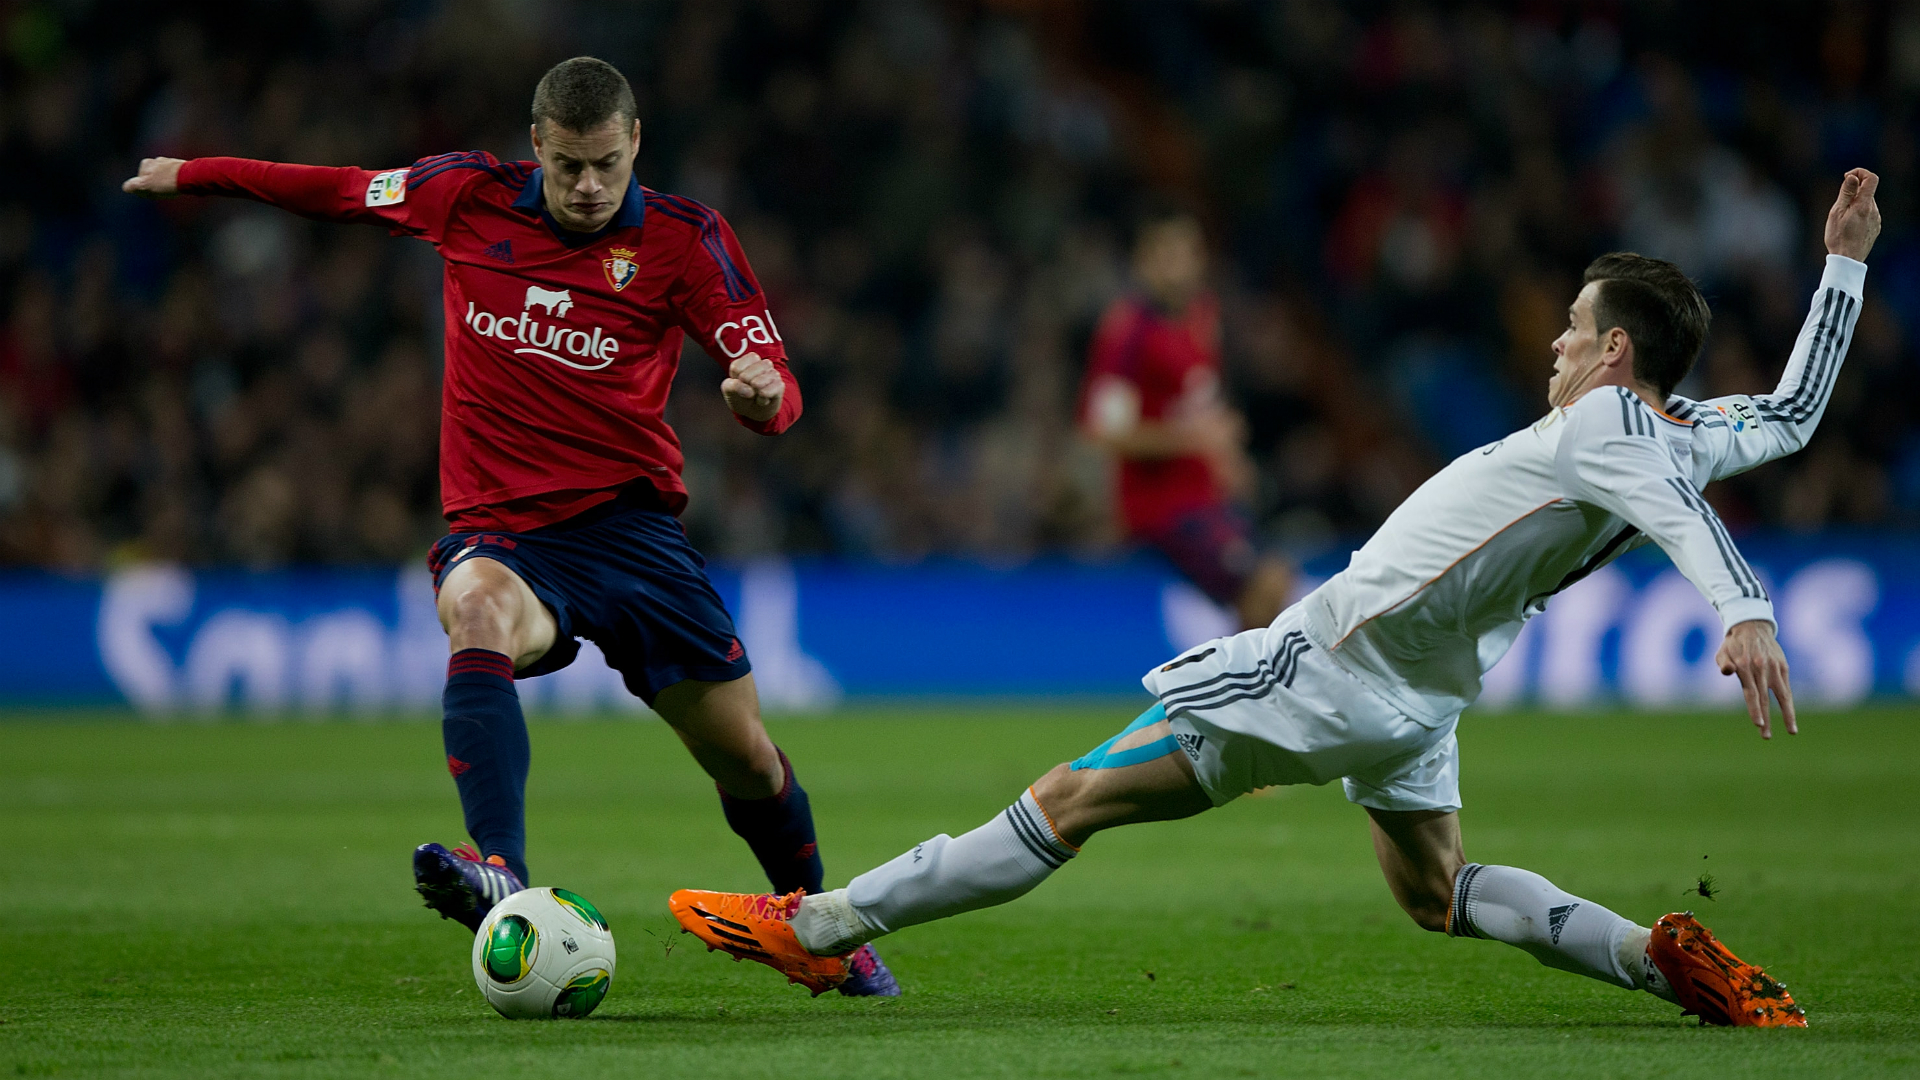 Oriol Riera - Gareth Bale